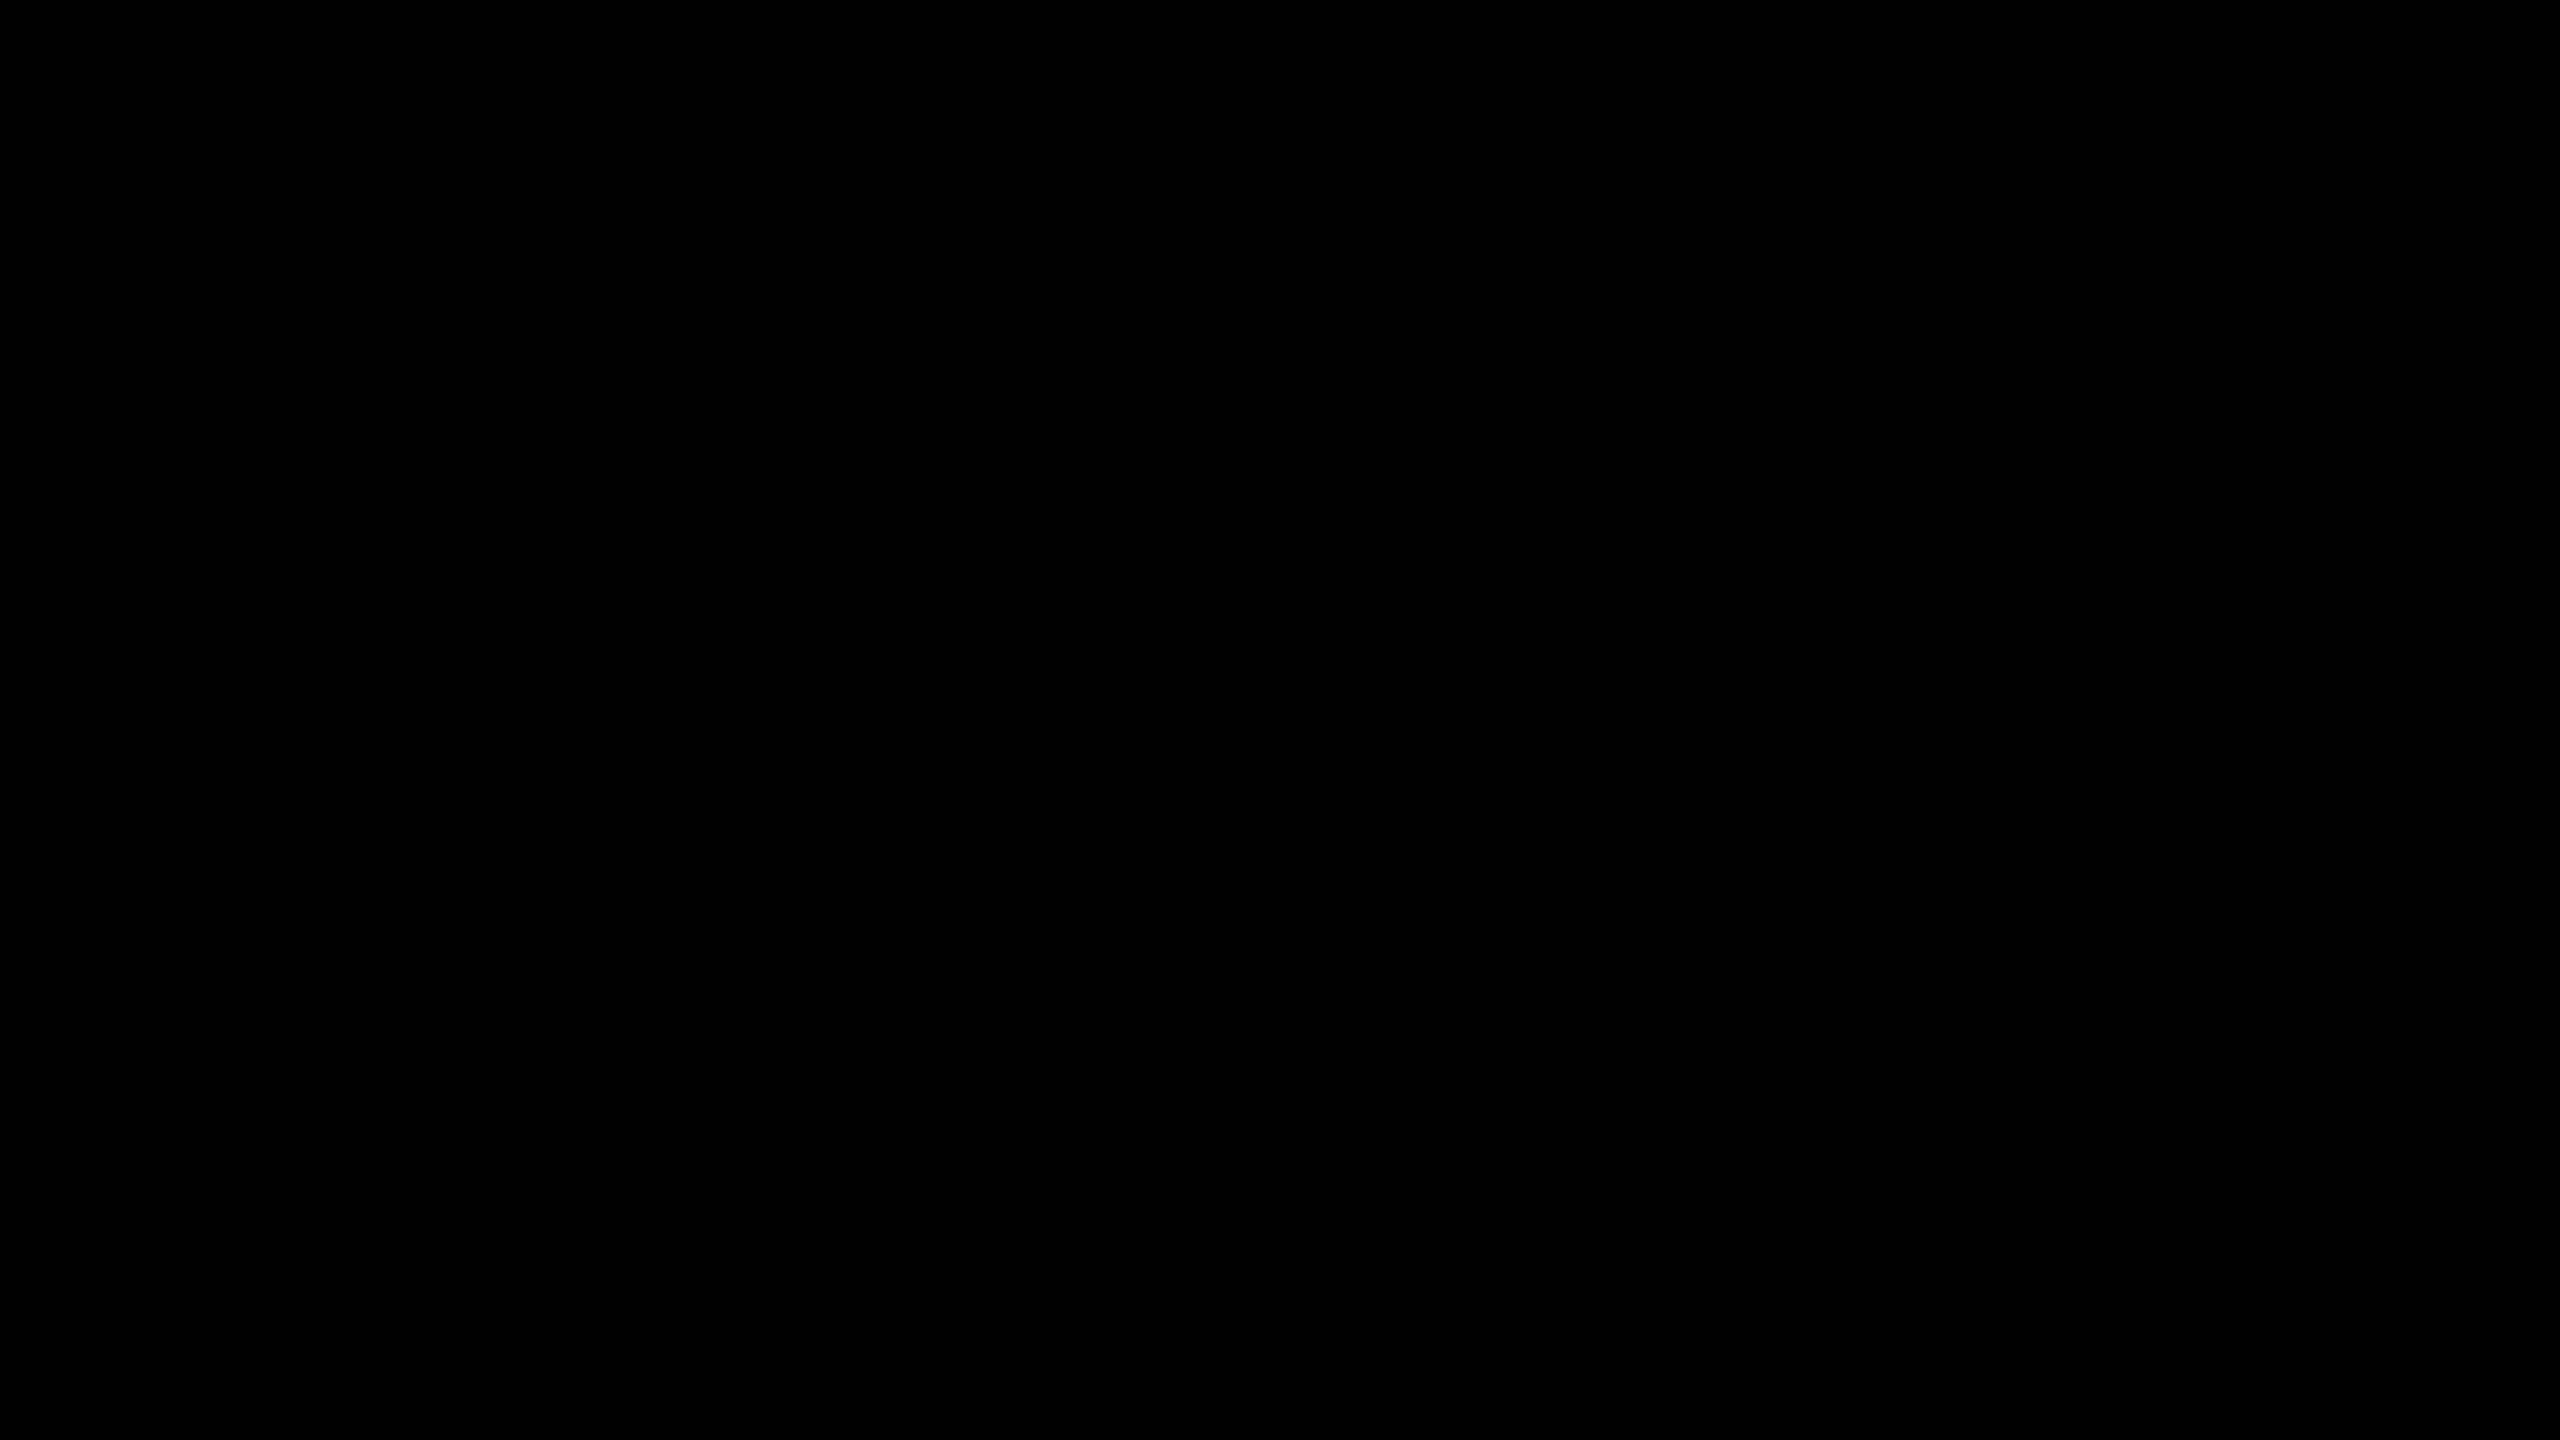 2560x1440 Black Solid Color Background Bjorne Of Norway